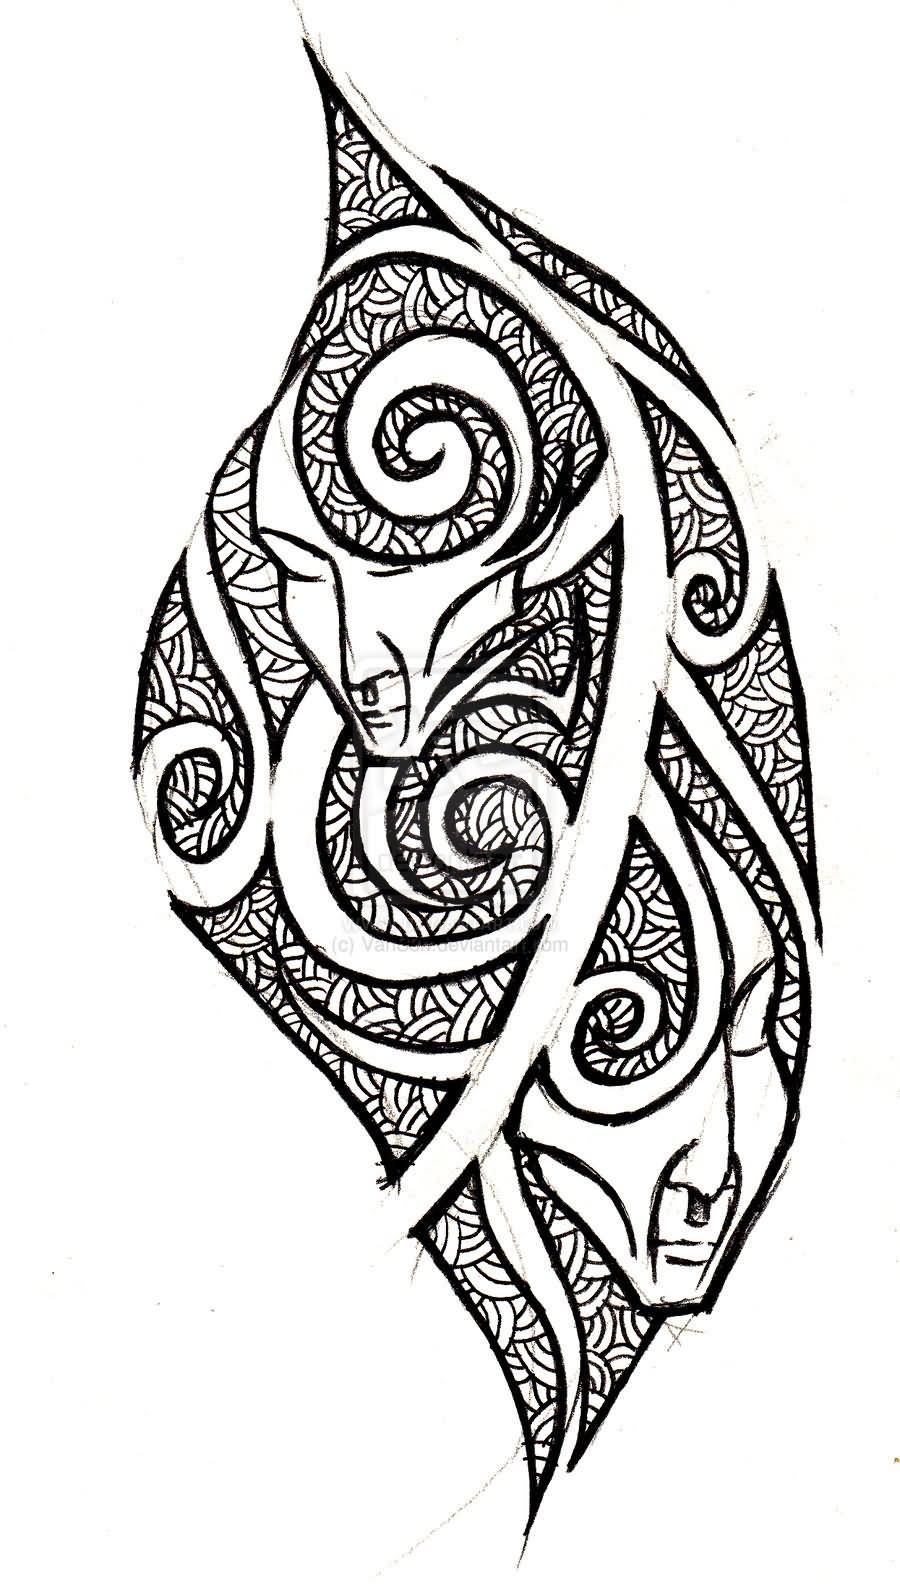 25 tribal gemini tattoos designs and ideas. Black Bedroom Furniture Sets. Home Design Ideas